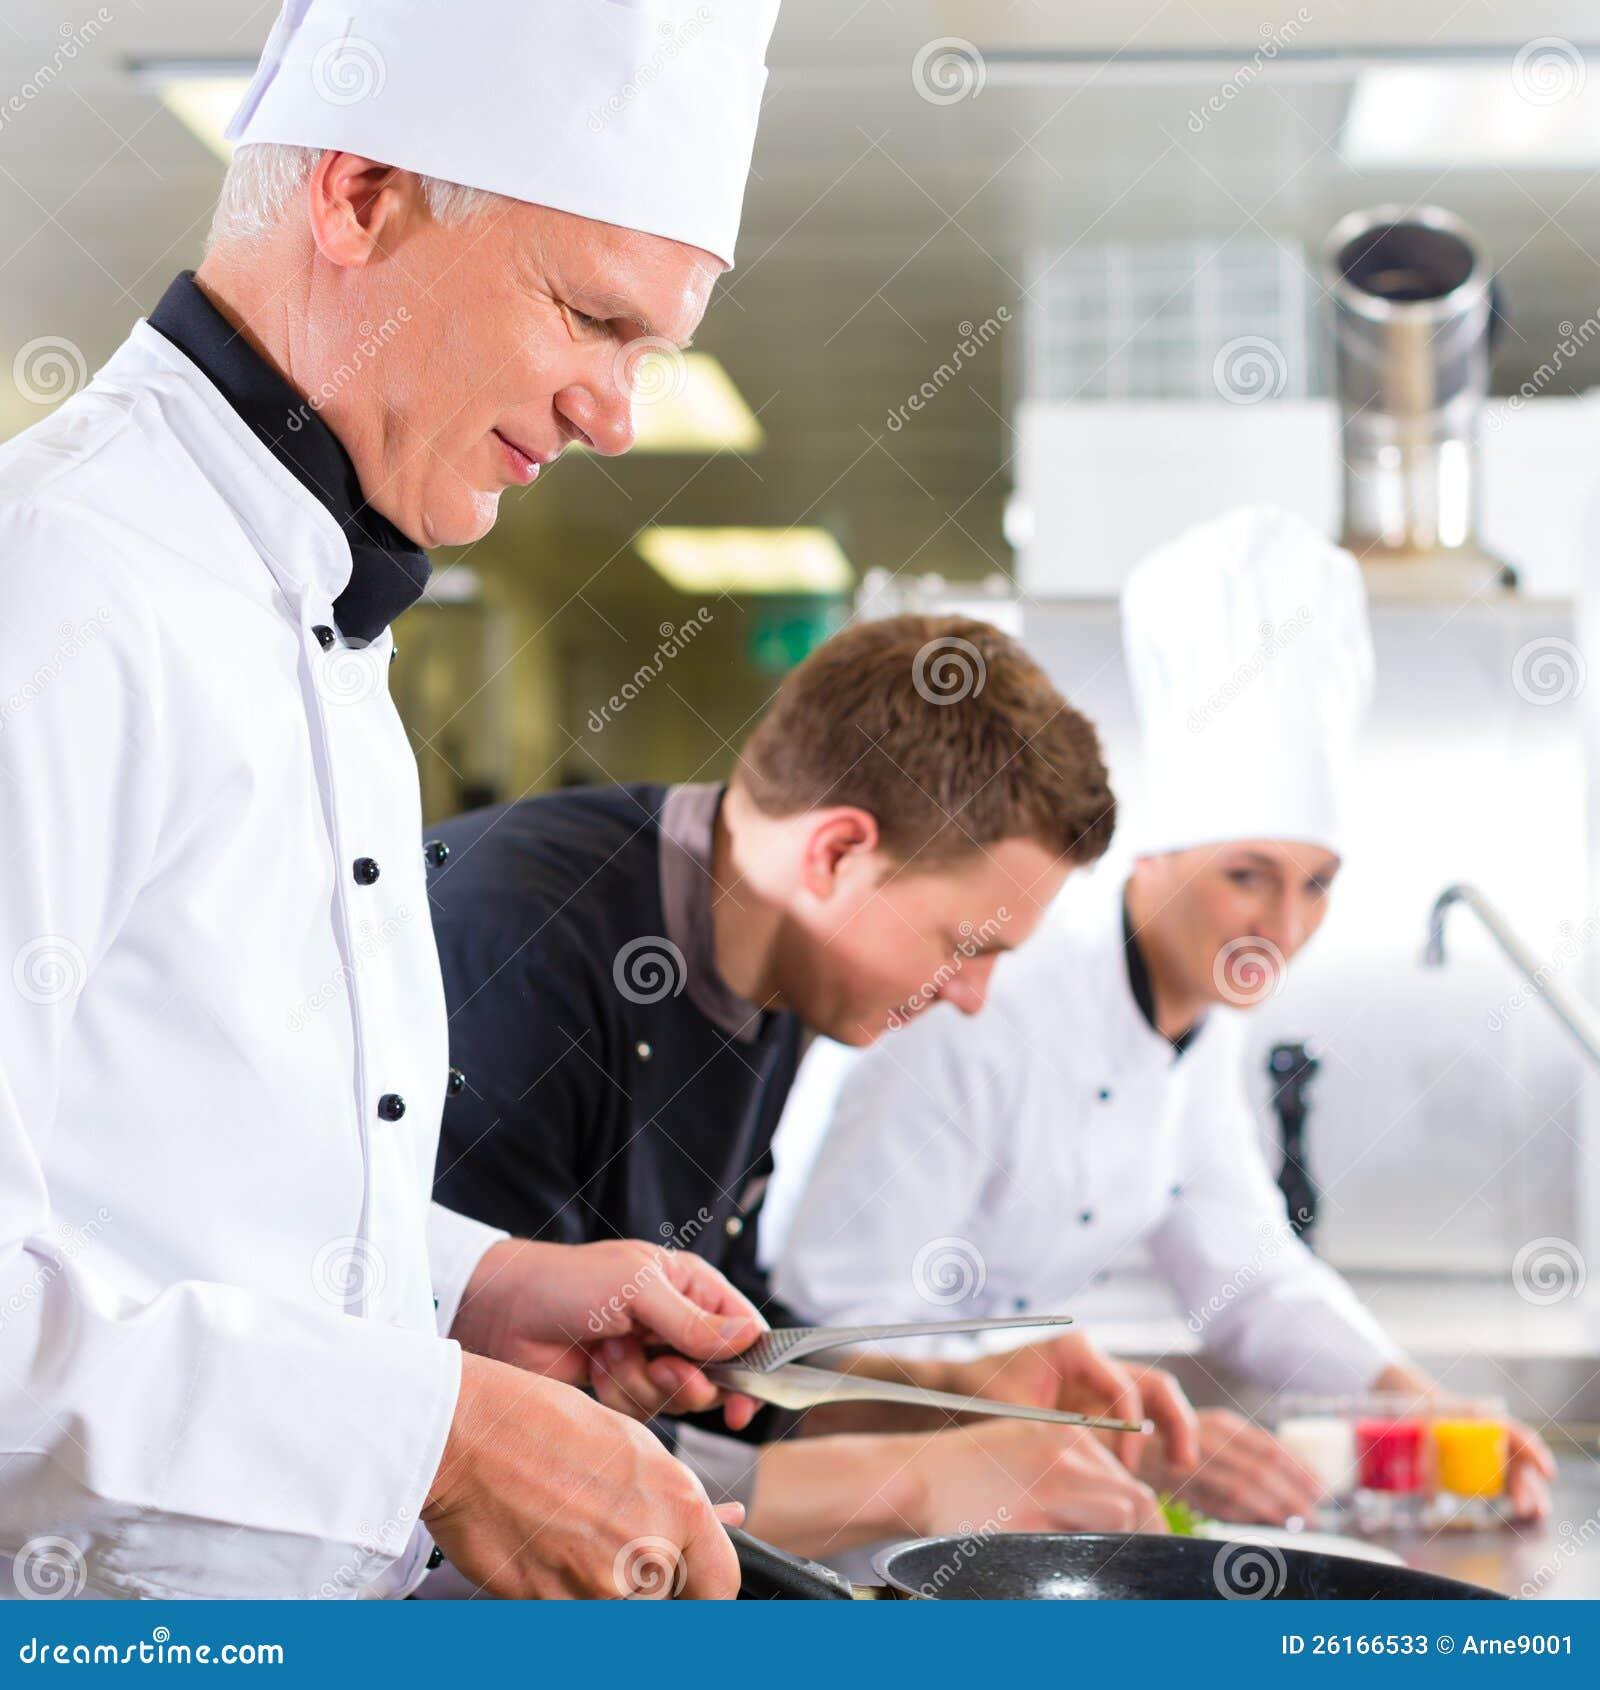 Restaurant Kitchen Manager Job Description: Restaurant Team, Man Cooking Chef, Manager, Waiter, Cleaning Woman. Cartoon Vector